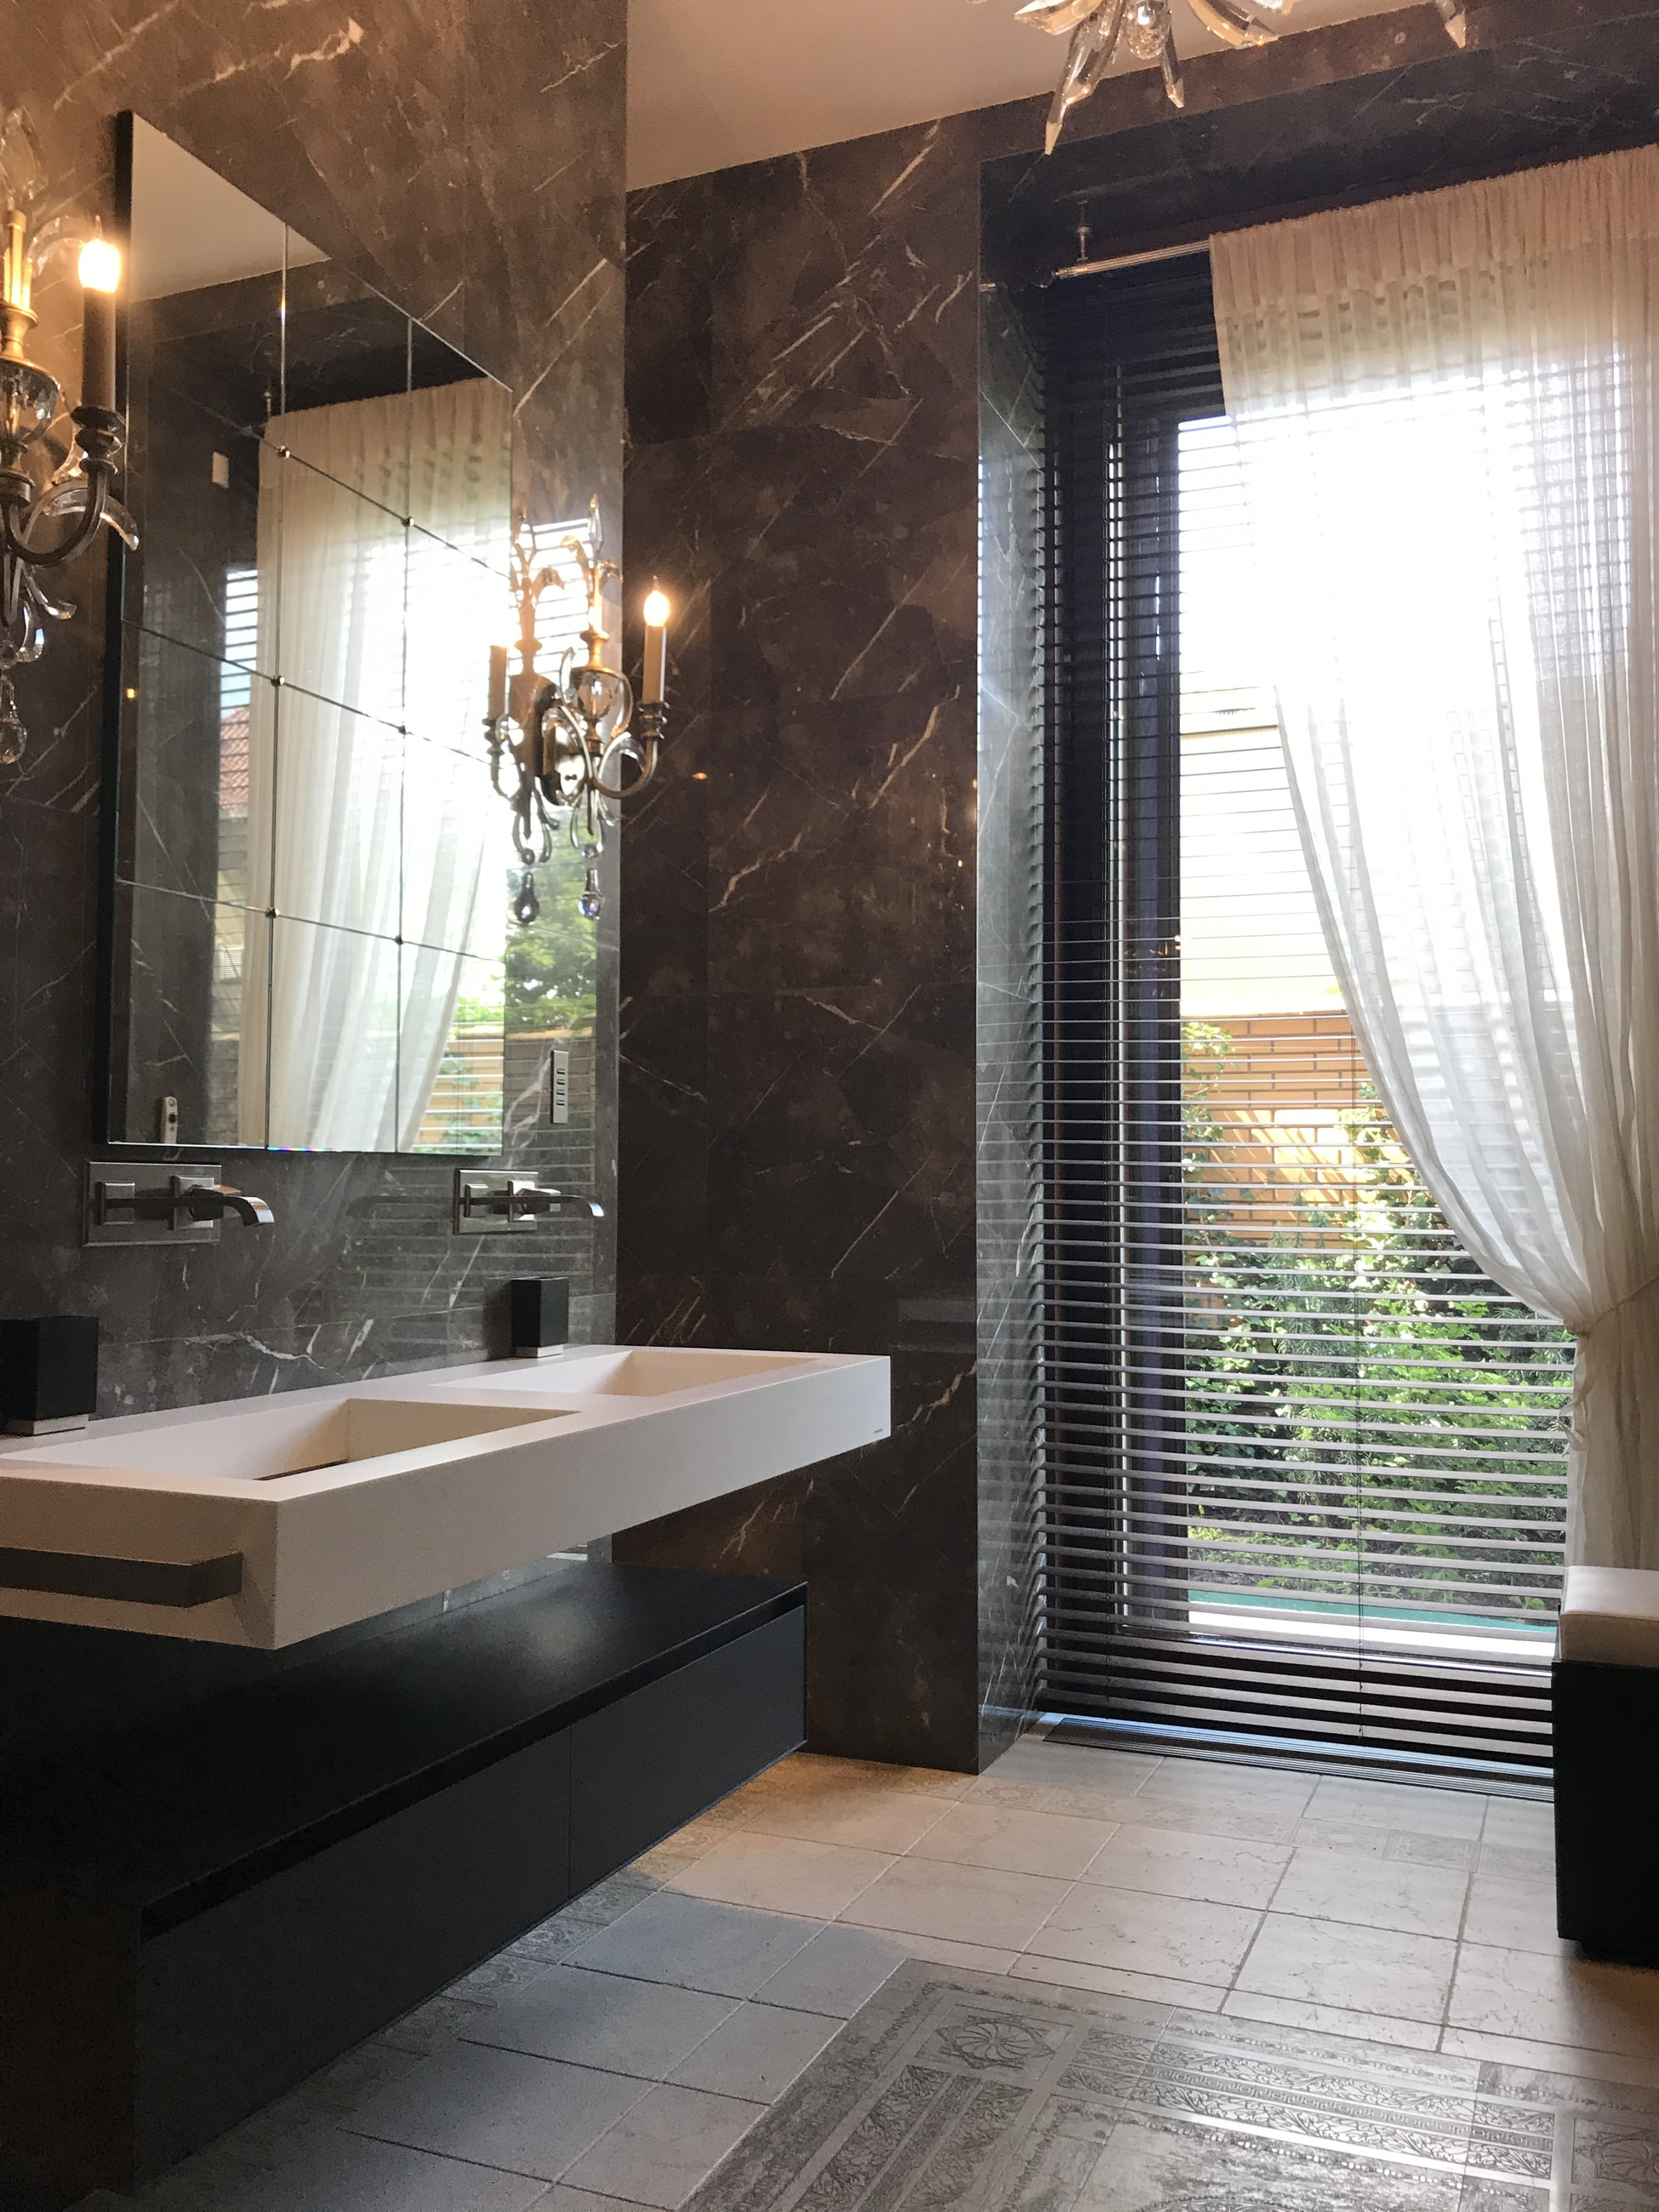 Backyard View Bathroom Decor Ideas